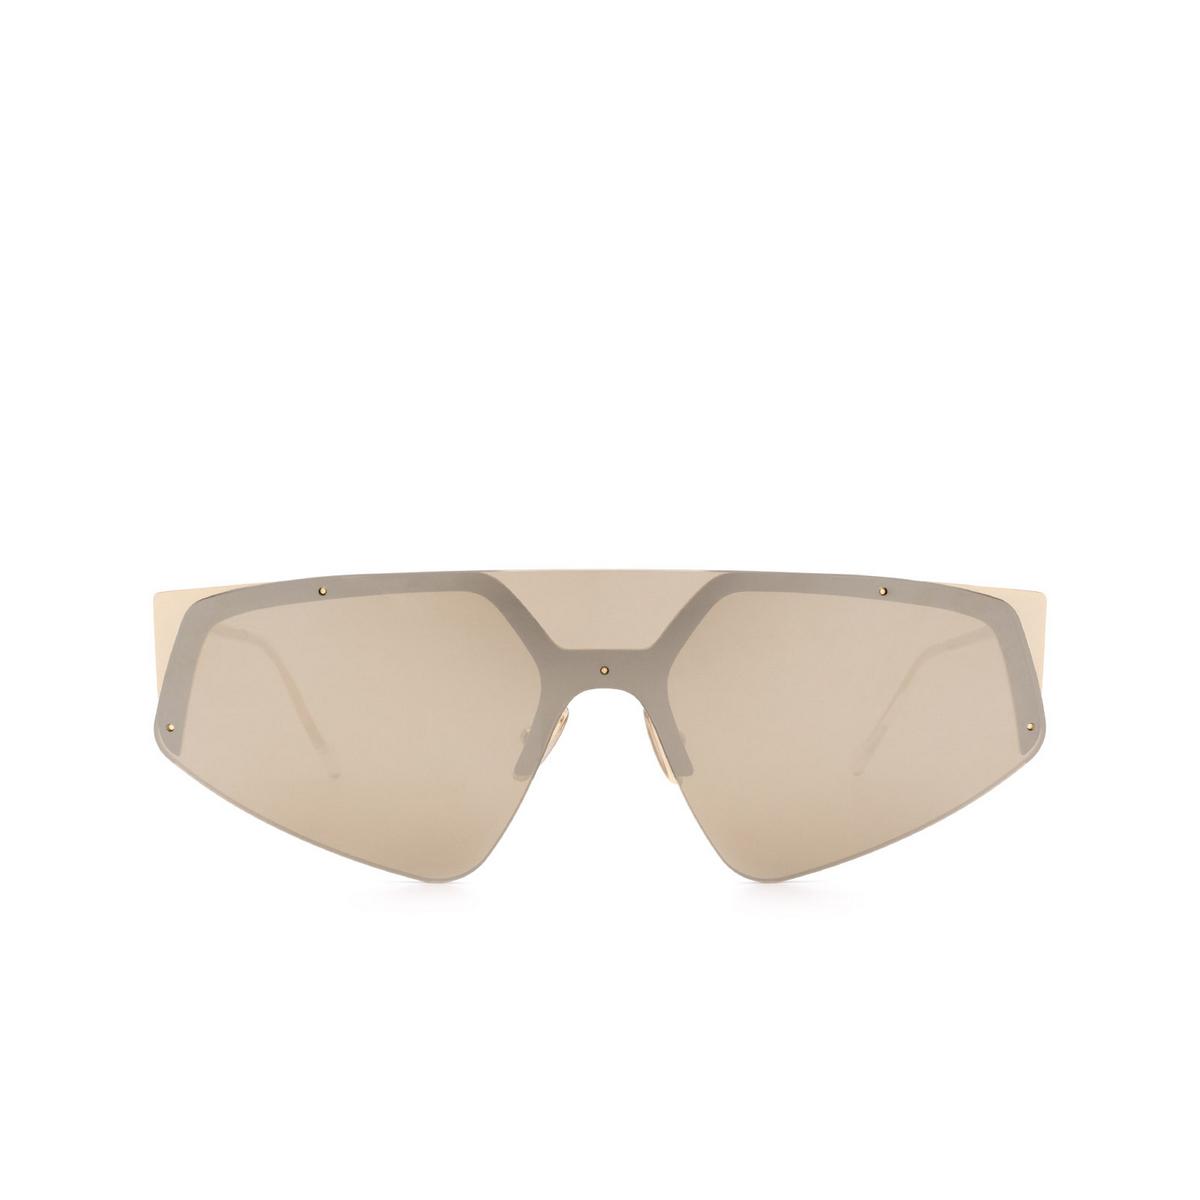 Sportmax® Mask Sunglasses: SM0034 color Gold 32G - front view.